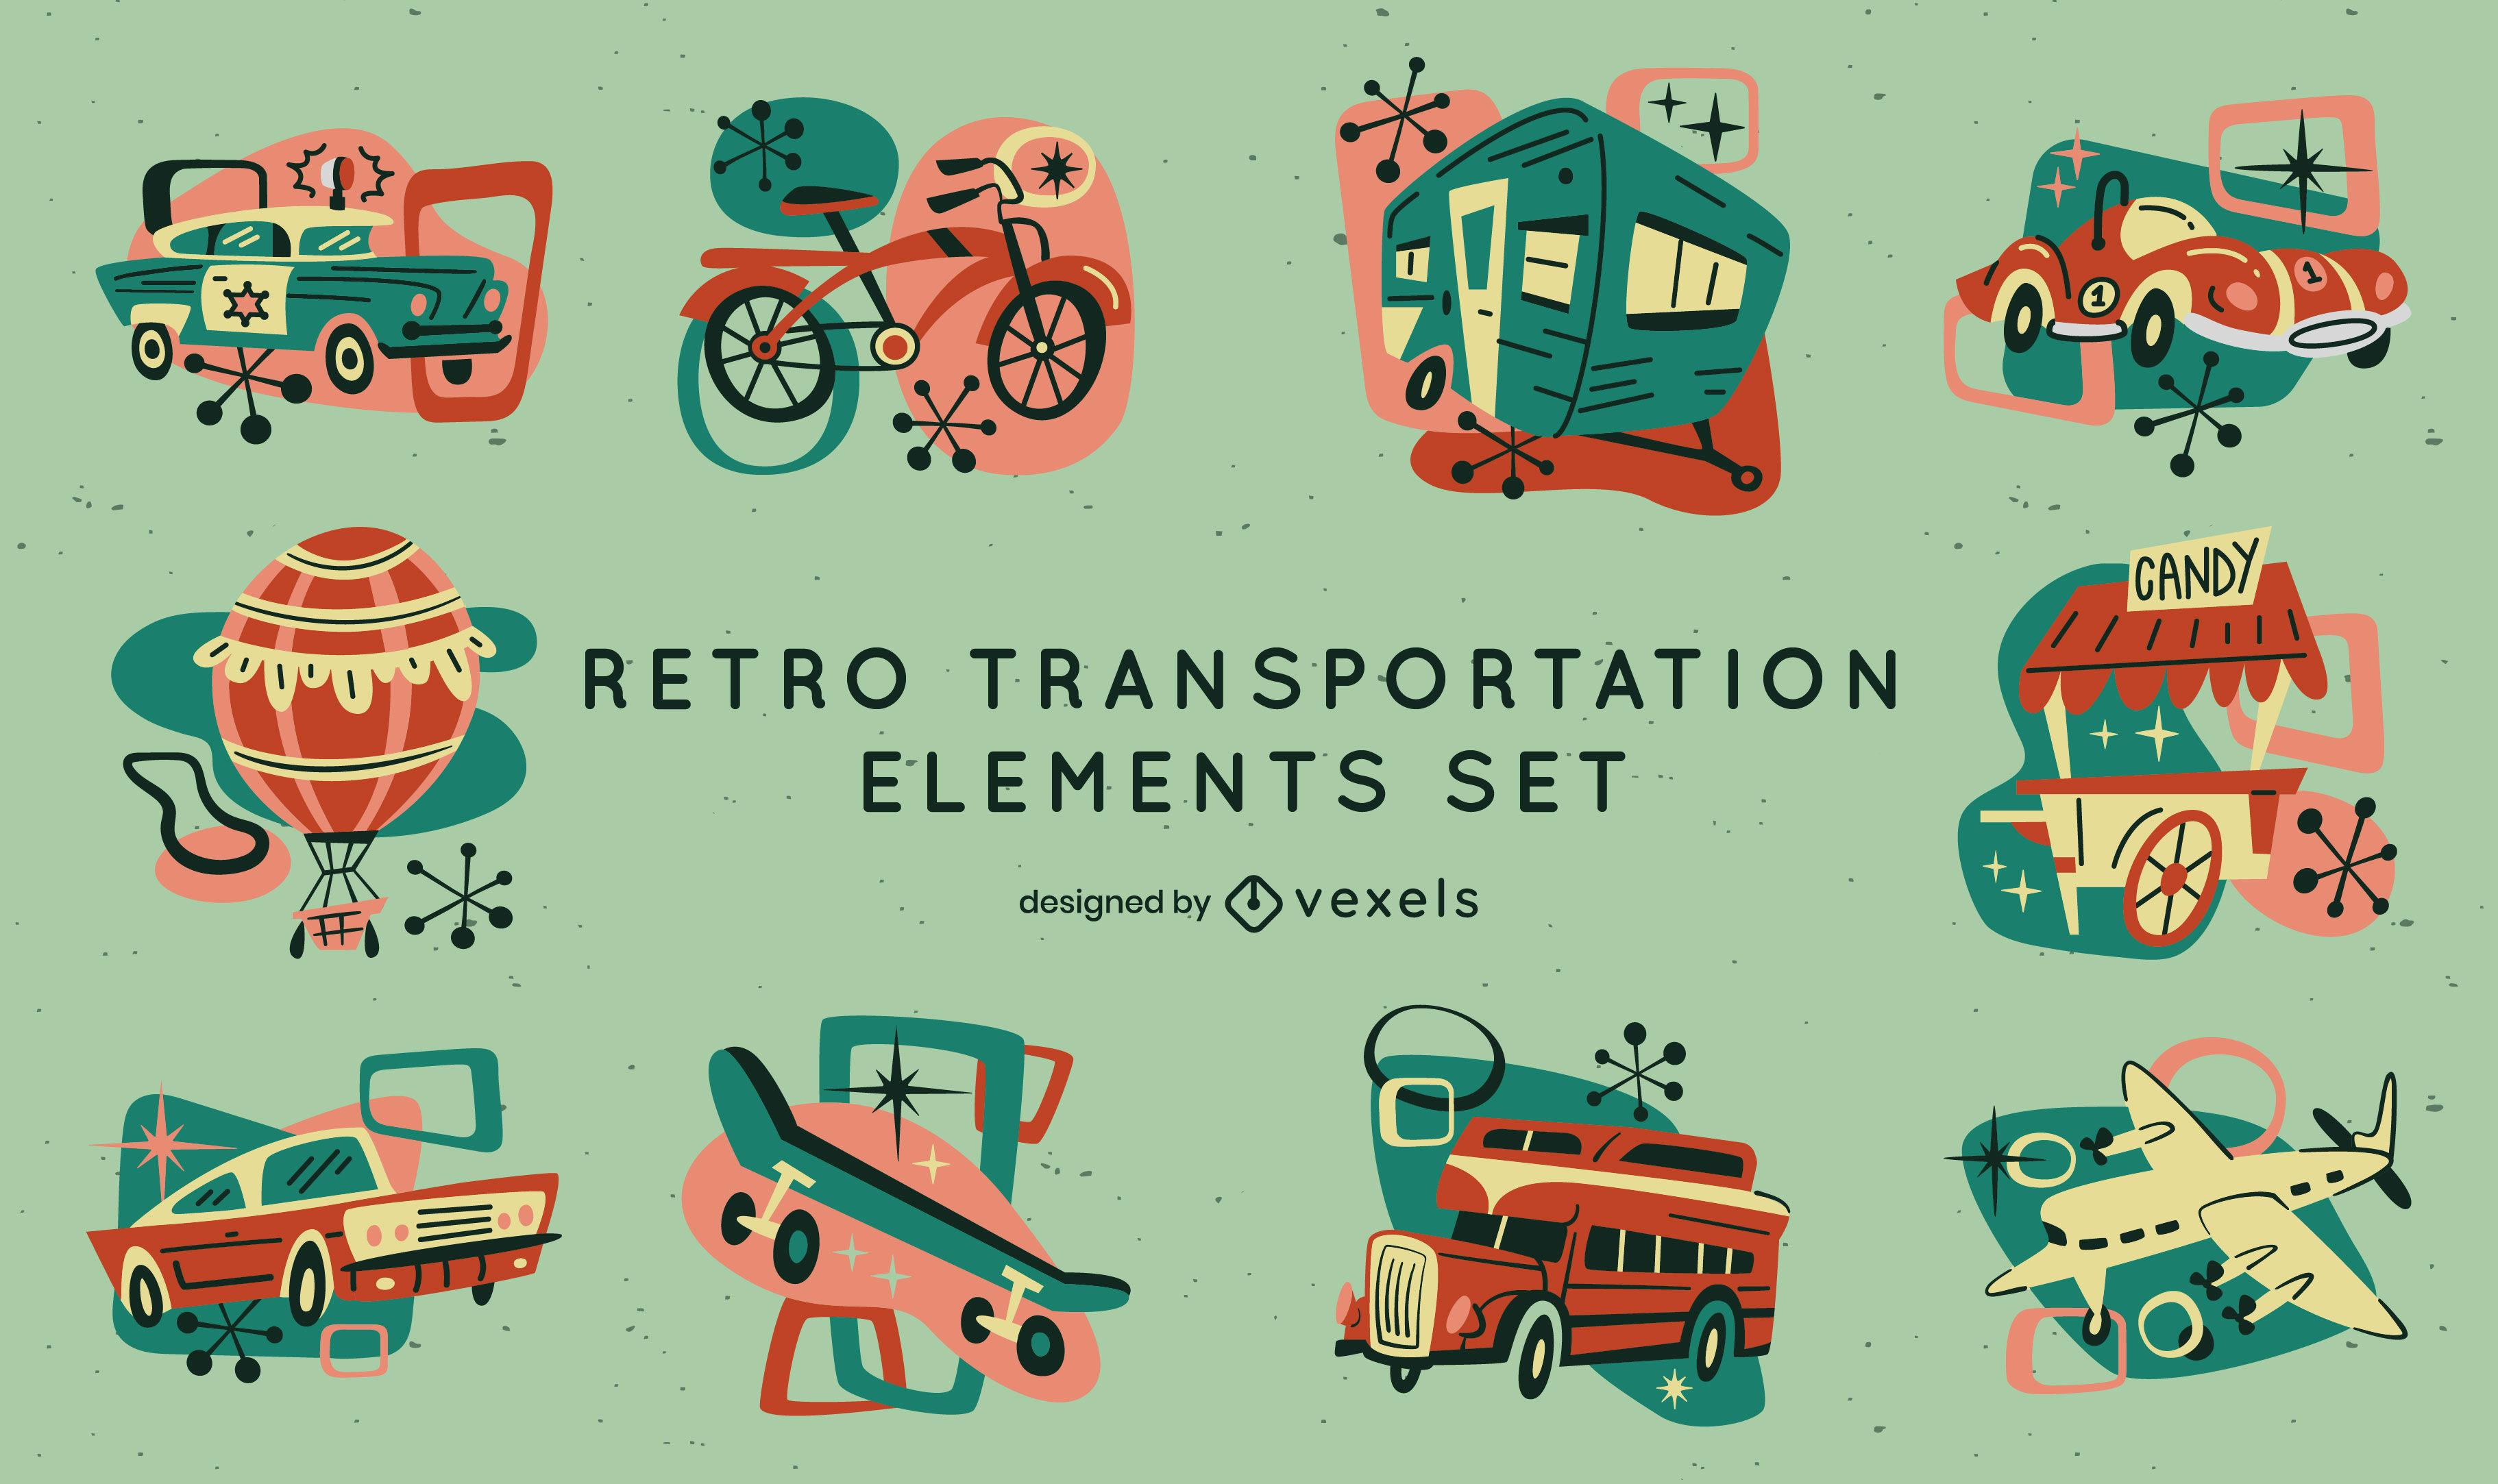 Retro-Cartoon-Transport- und -Fahrzeugset